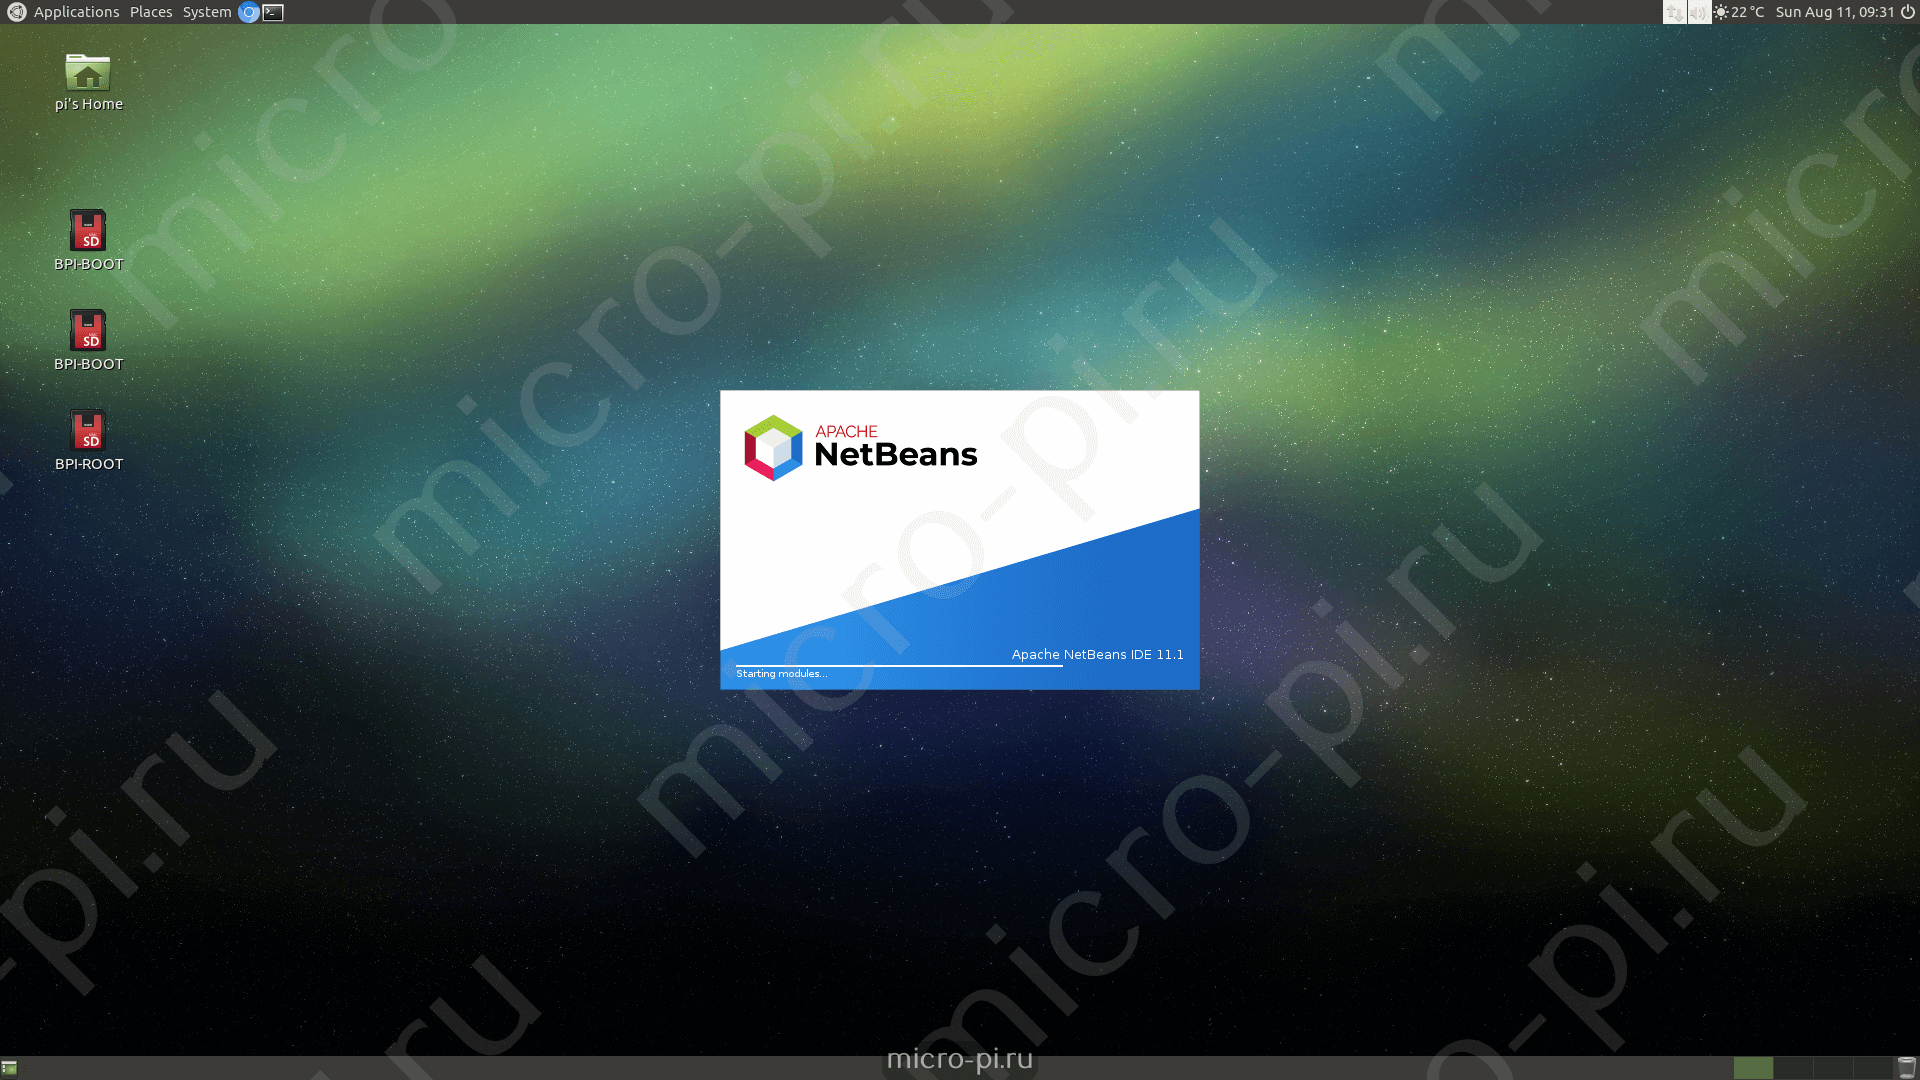 Установка Apache NetBeans 11 1 на Raspberry Pi/OPi/BPi - MicroPi